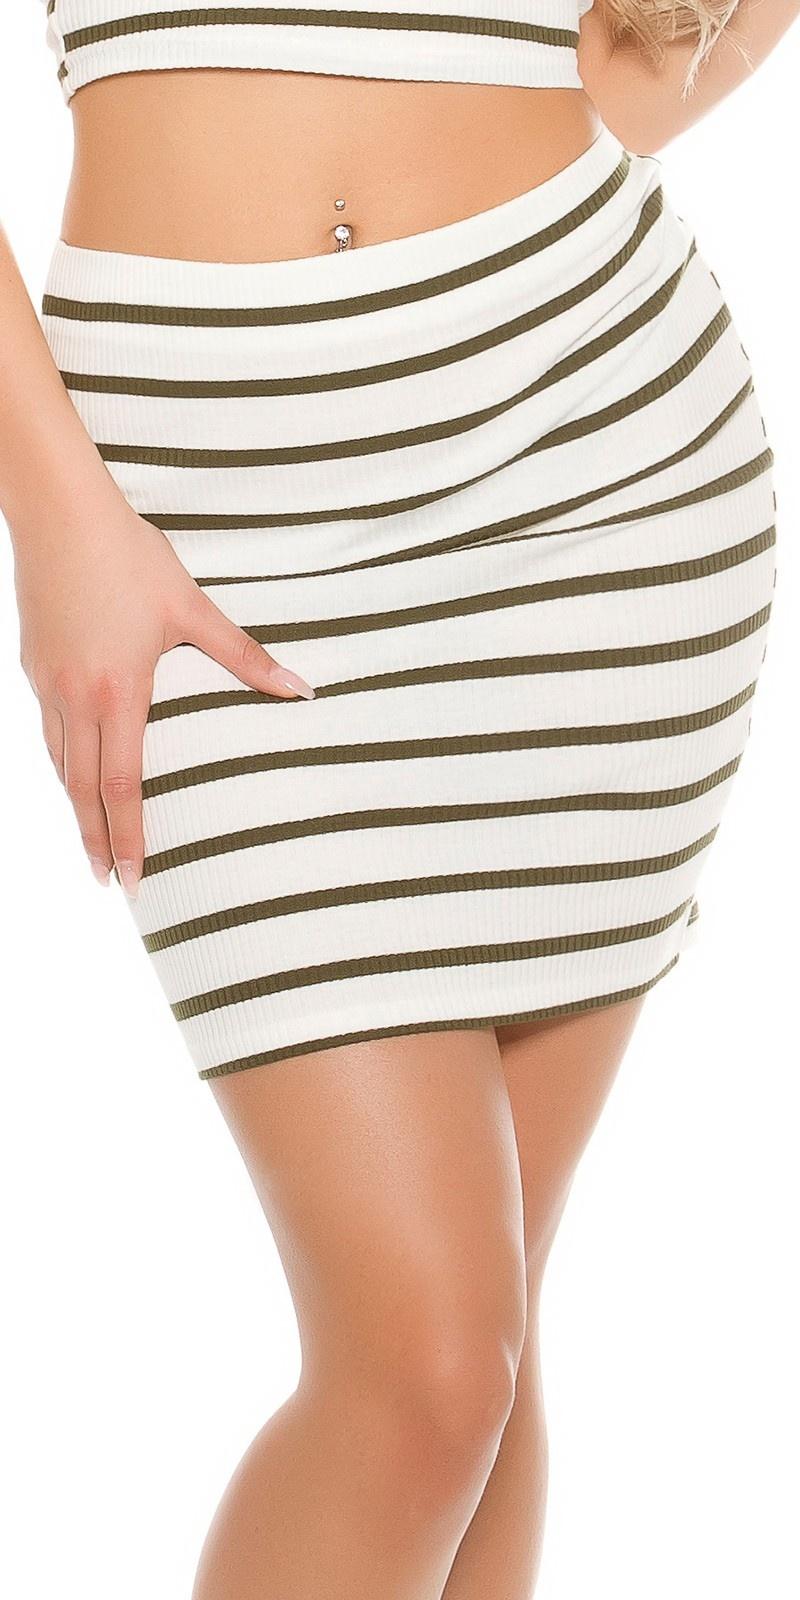 Sexy ribbed mini skirt striped Khaki